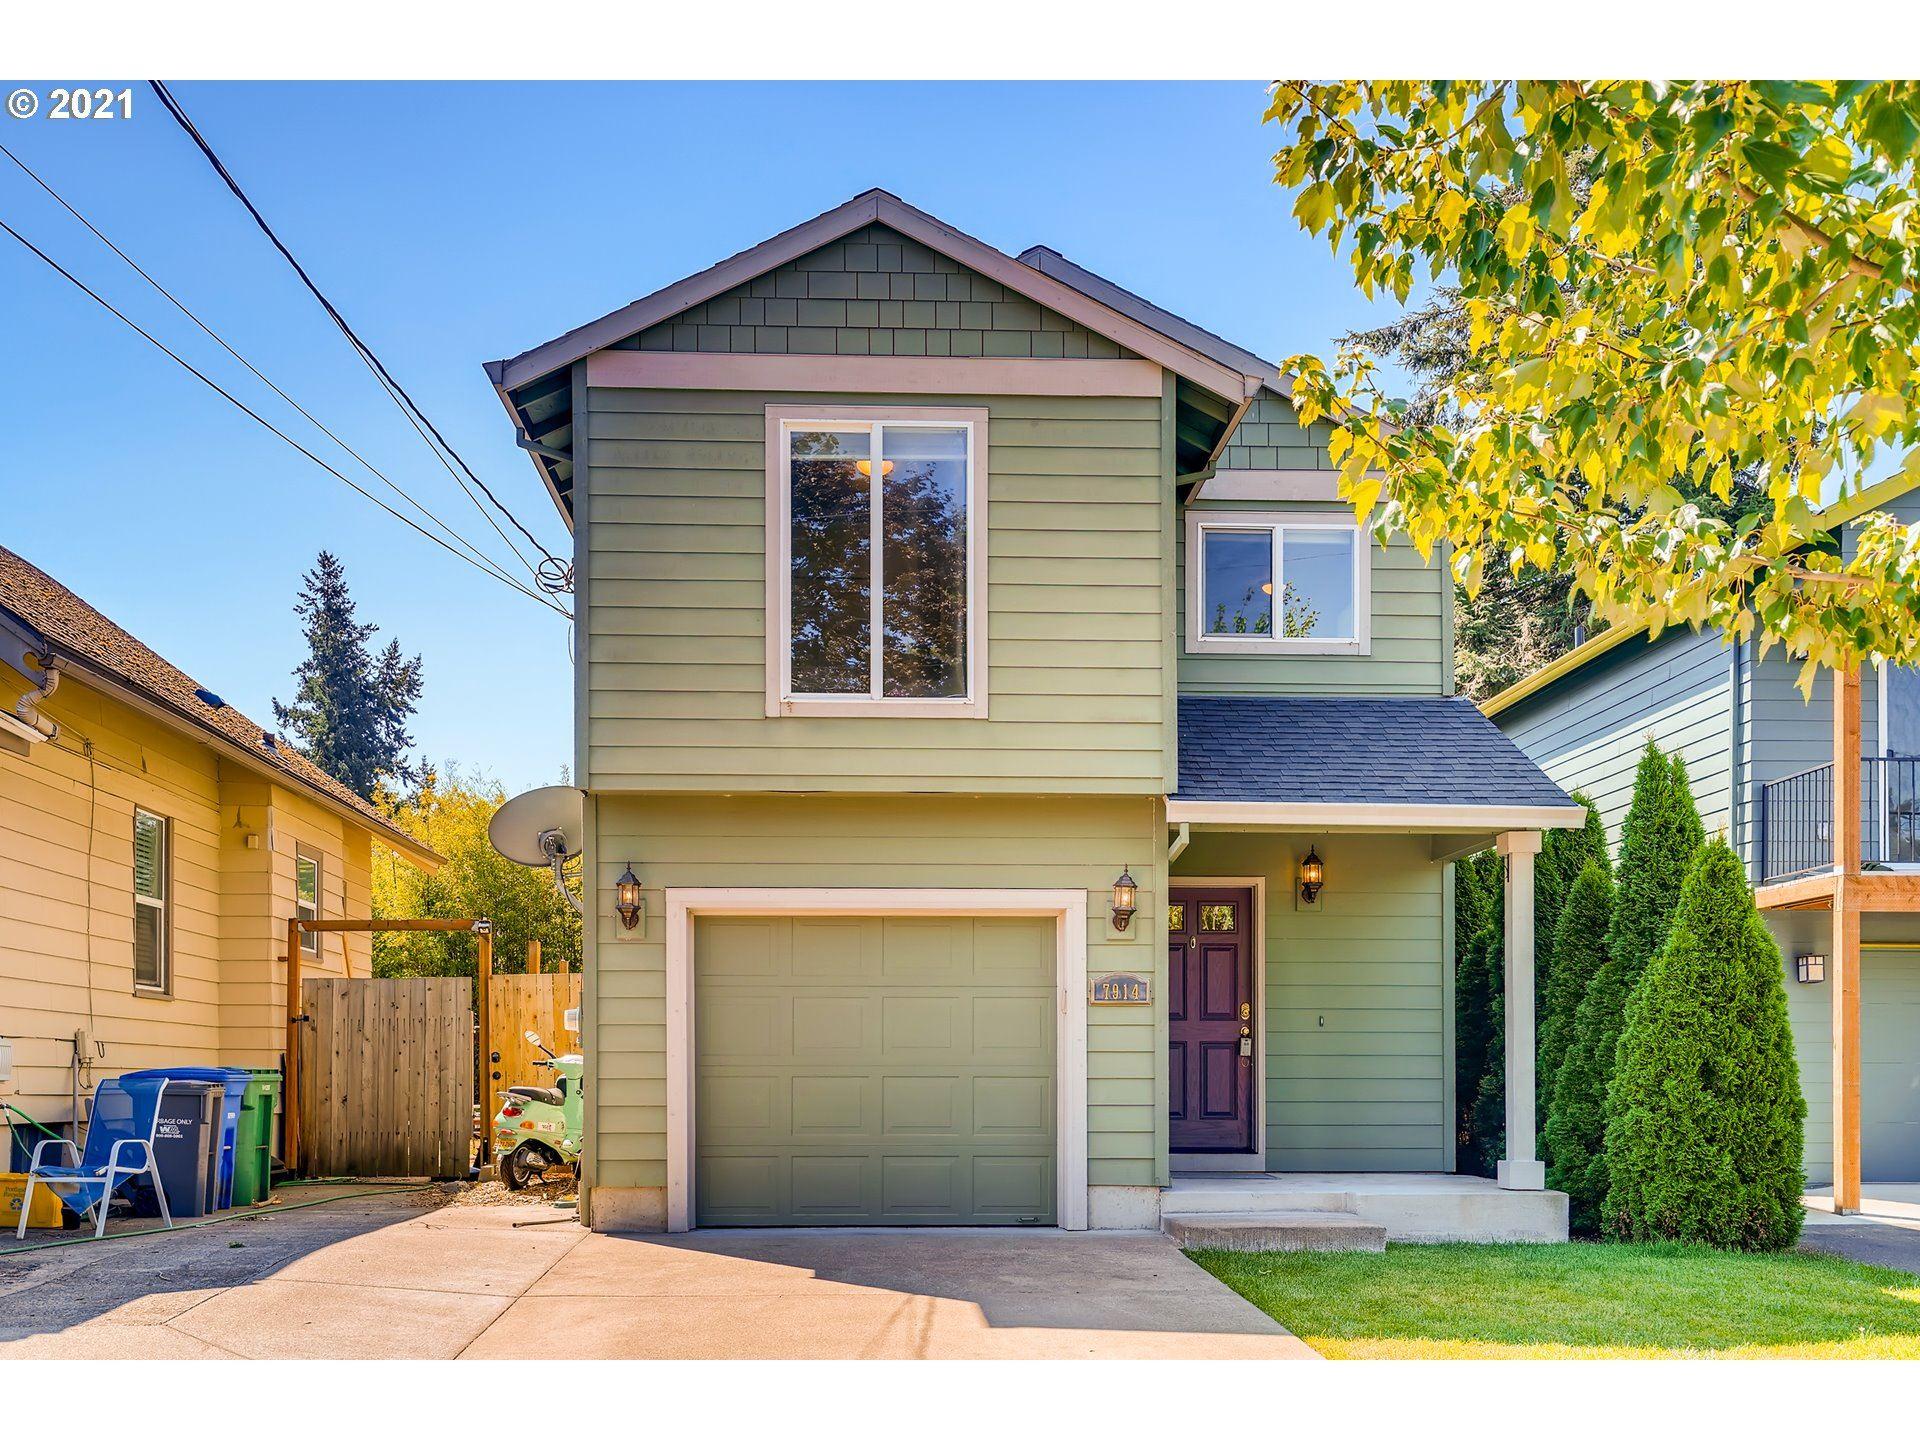 7914 SE TOLMAN ST, Portland, OR 97206 - MLS#: 21204974